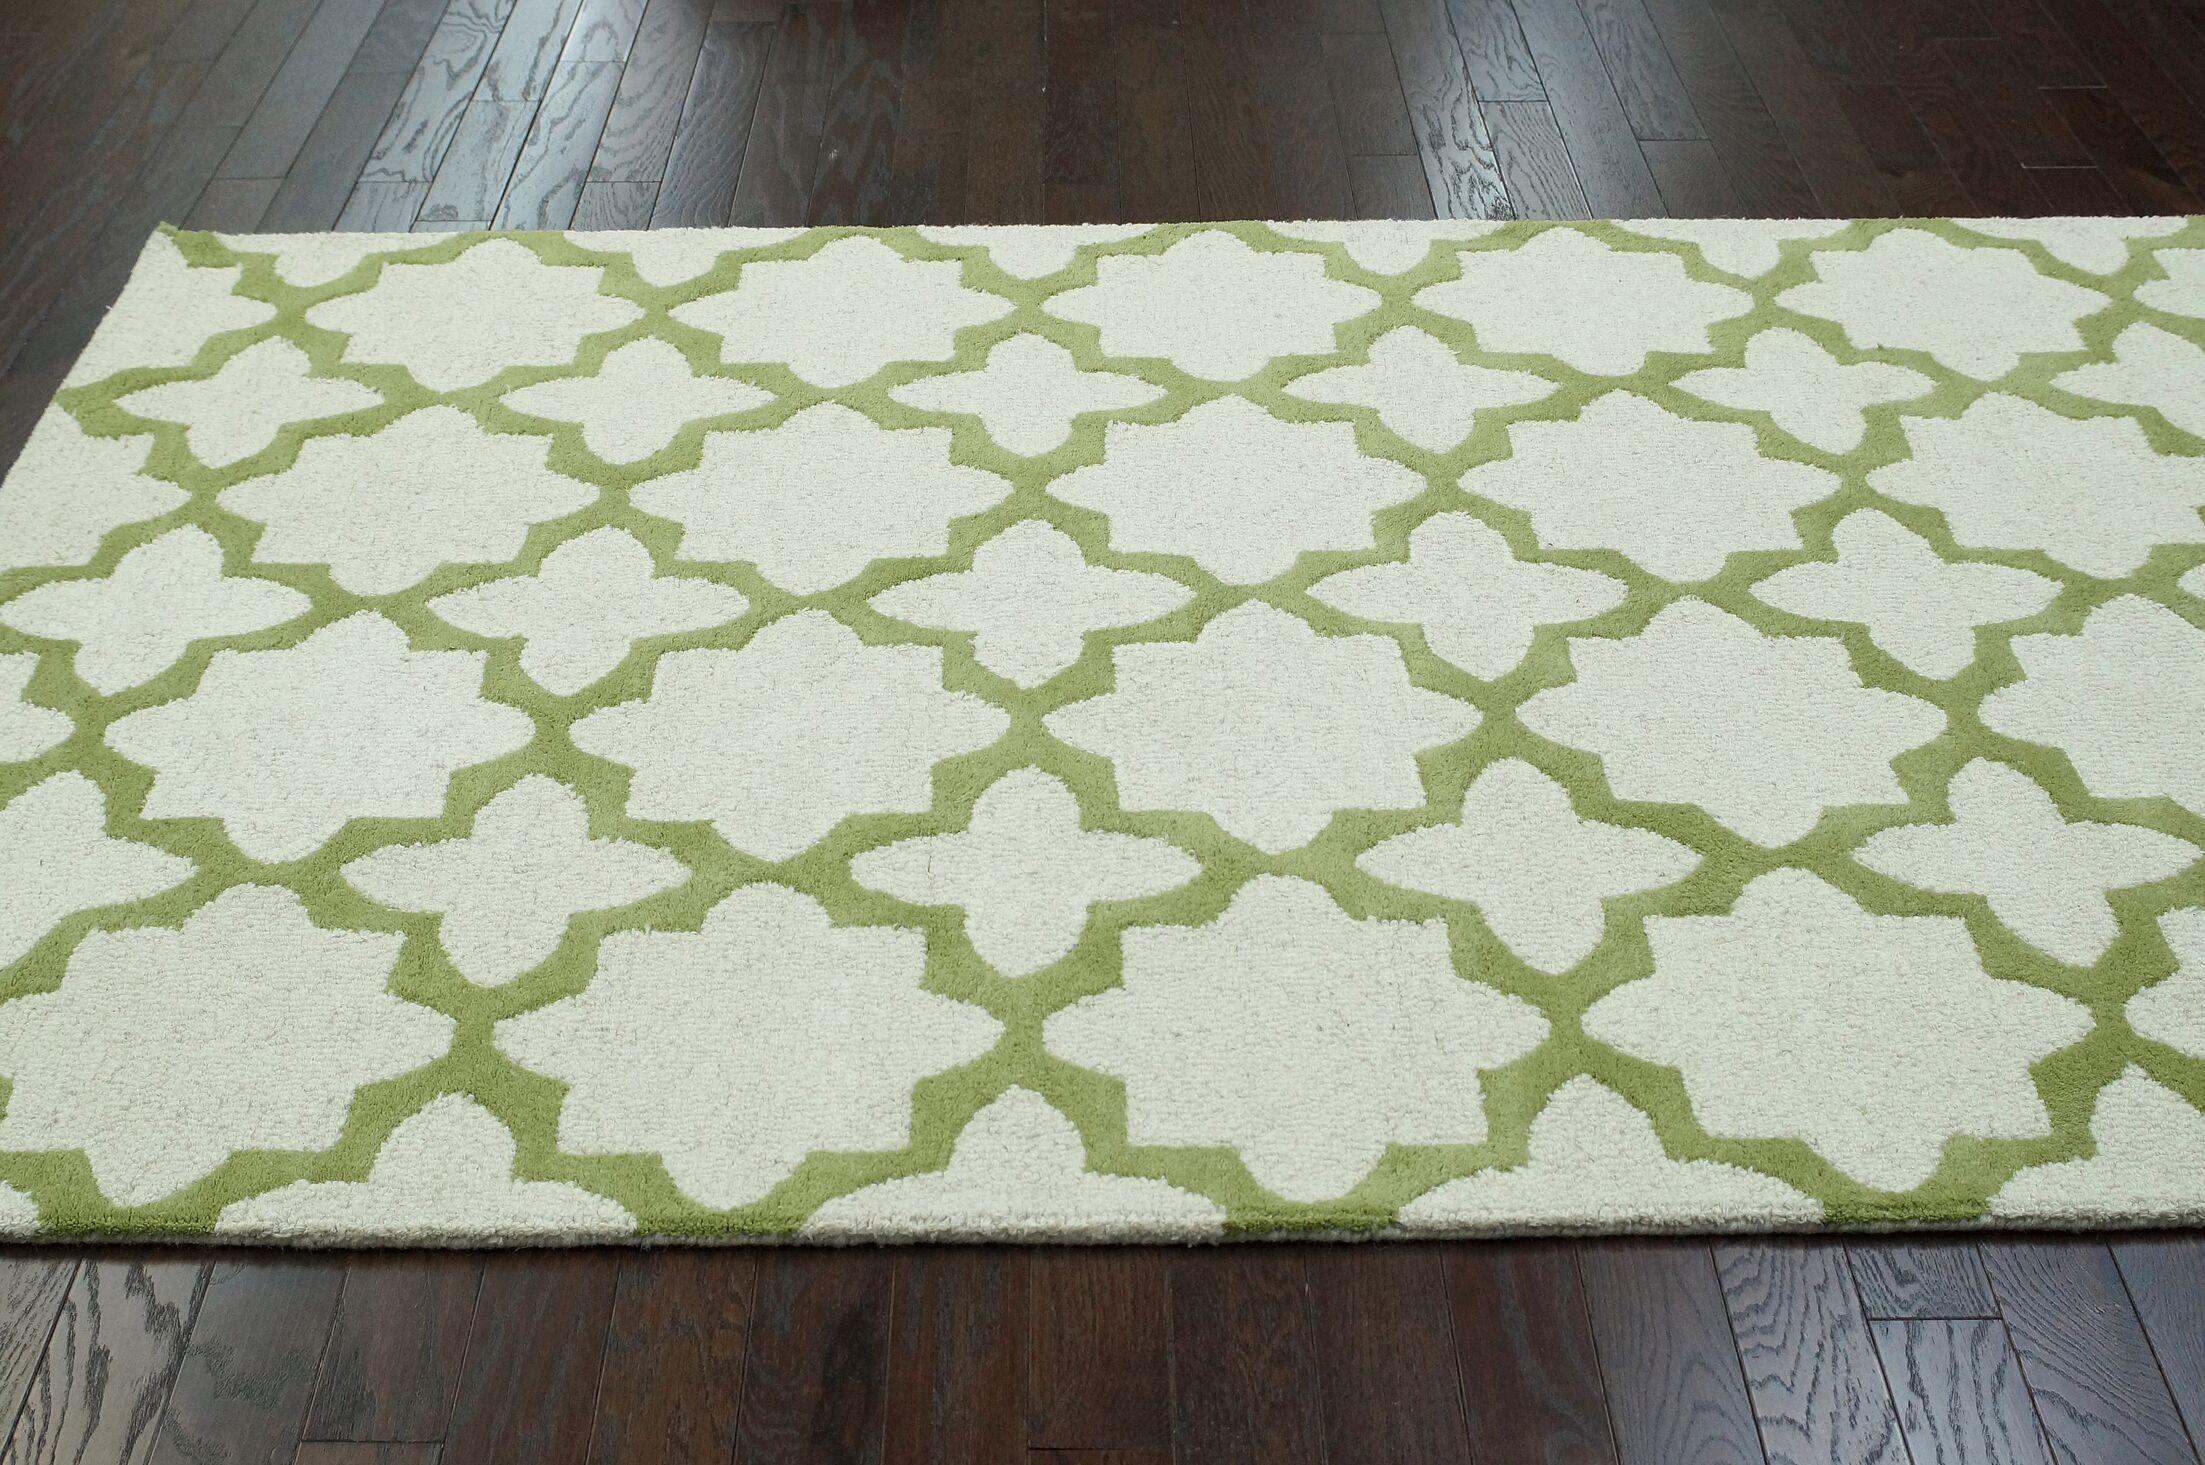 Moderna Donna Hand-Tufted Beige/Green Area Rug Rug Size: Rectangle 8'3